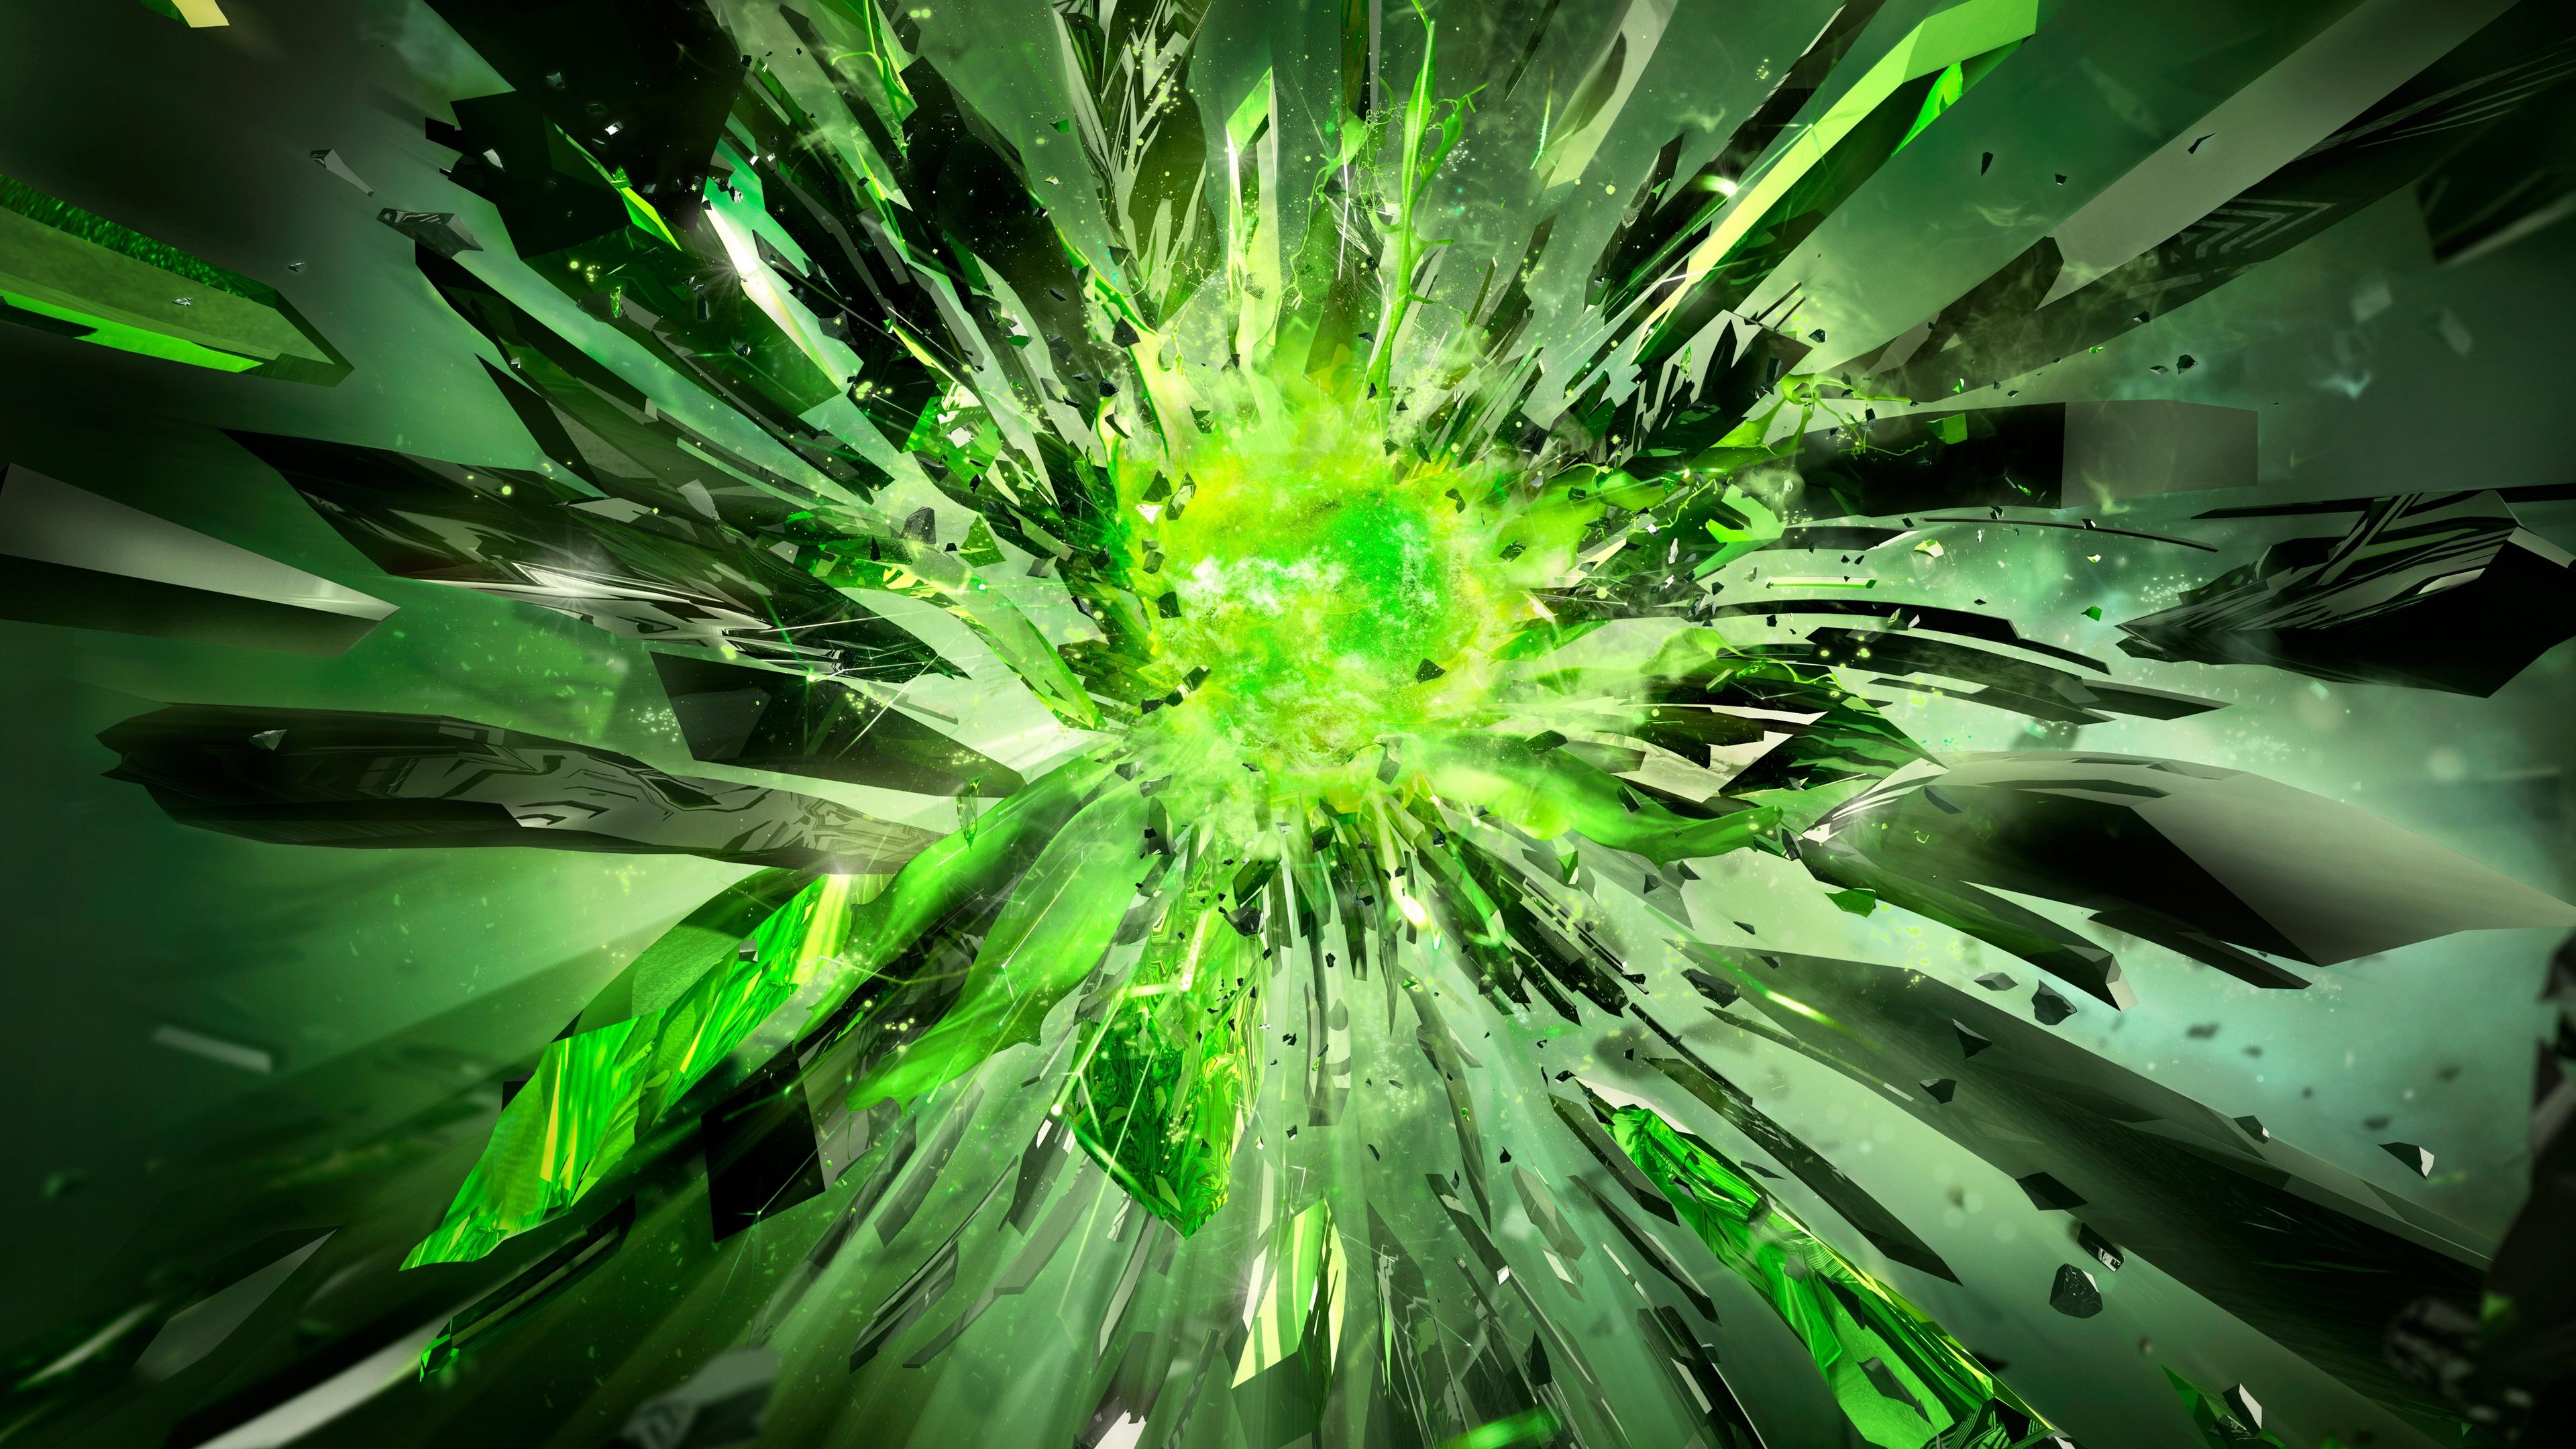 crystals debris explosion light 4k 1539370565 - crystals, debris, explosion, light 4k - Explosion, debris, Crystals